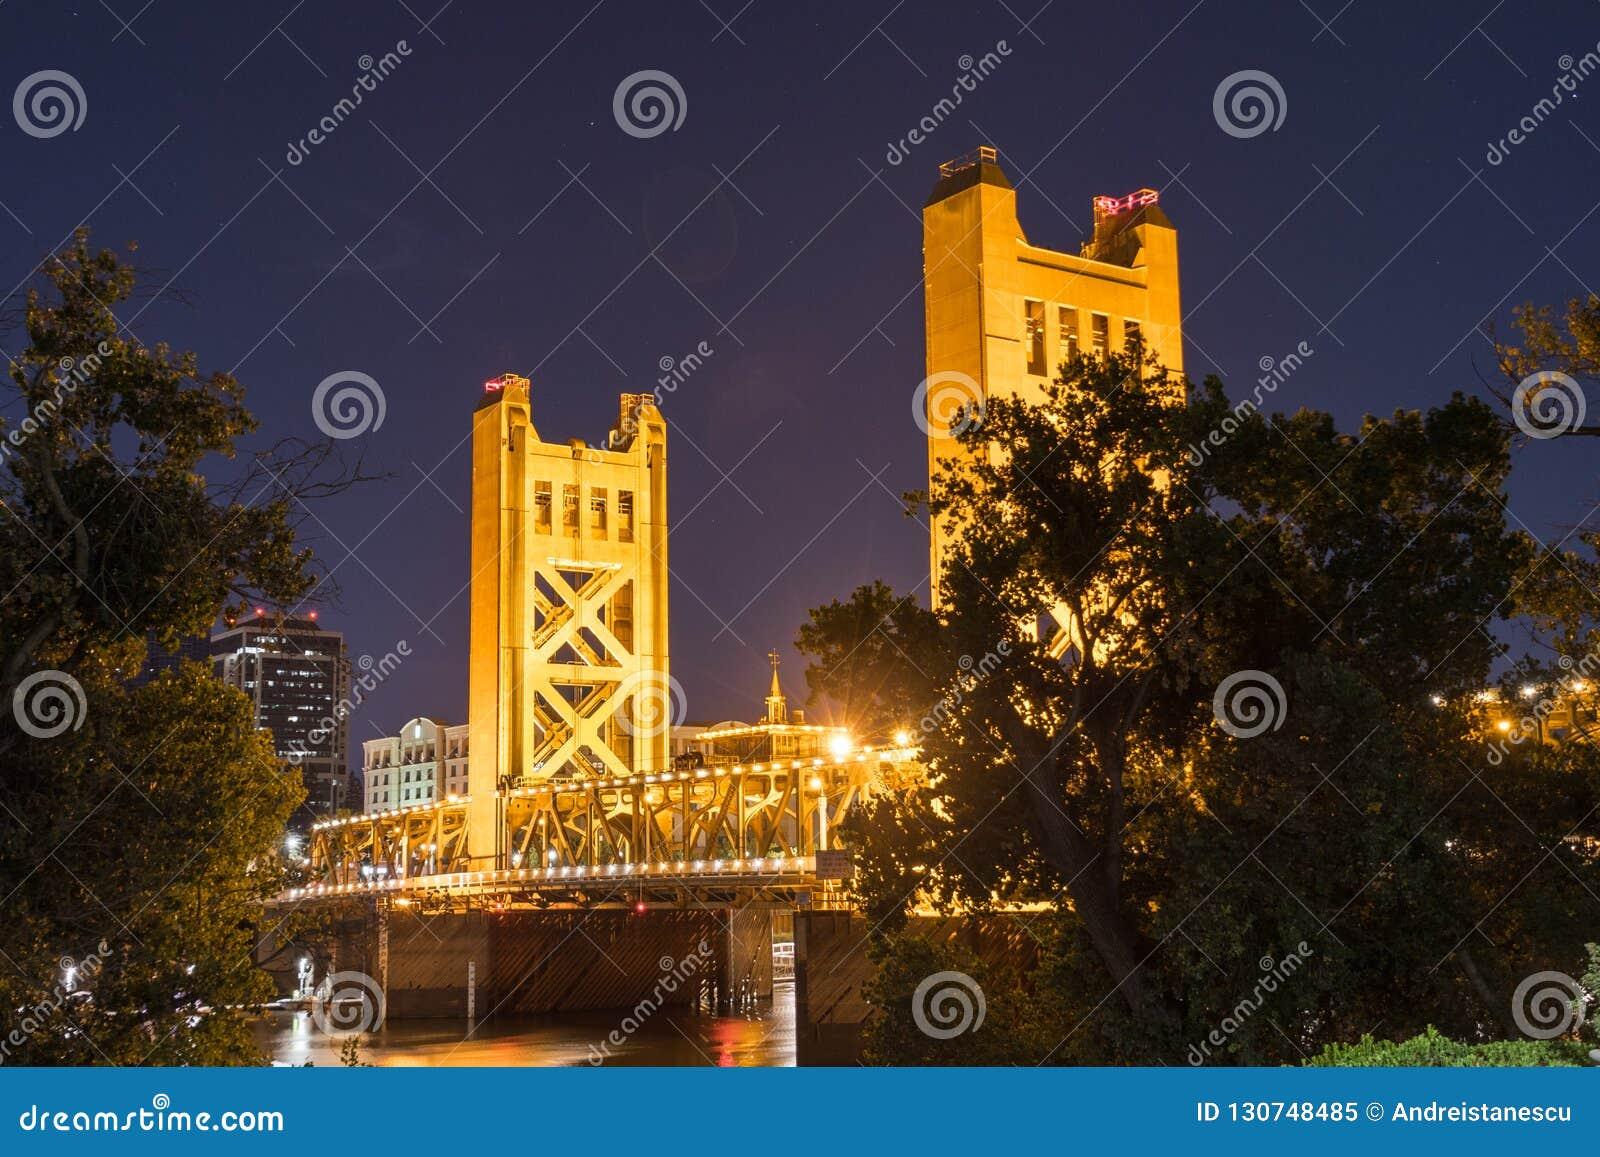 Night view of the Tower Bridge, Sacramento